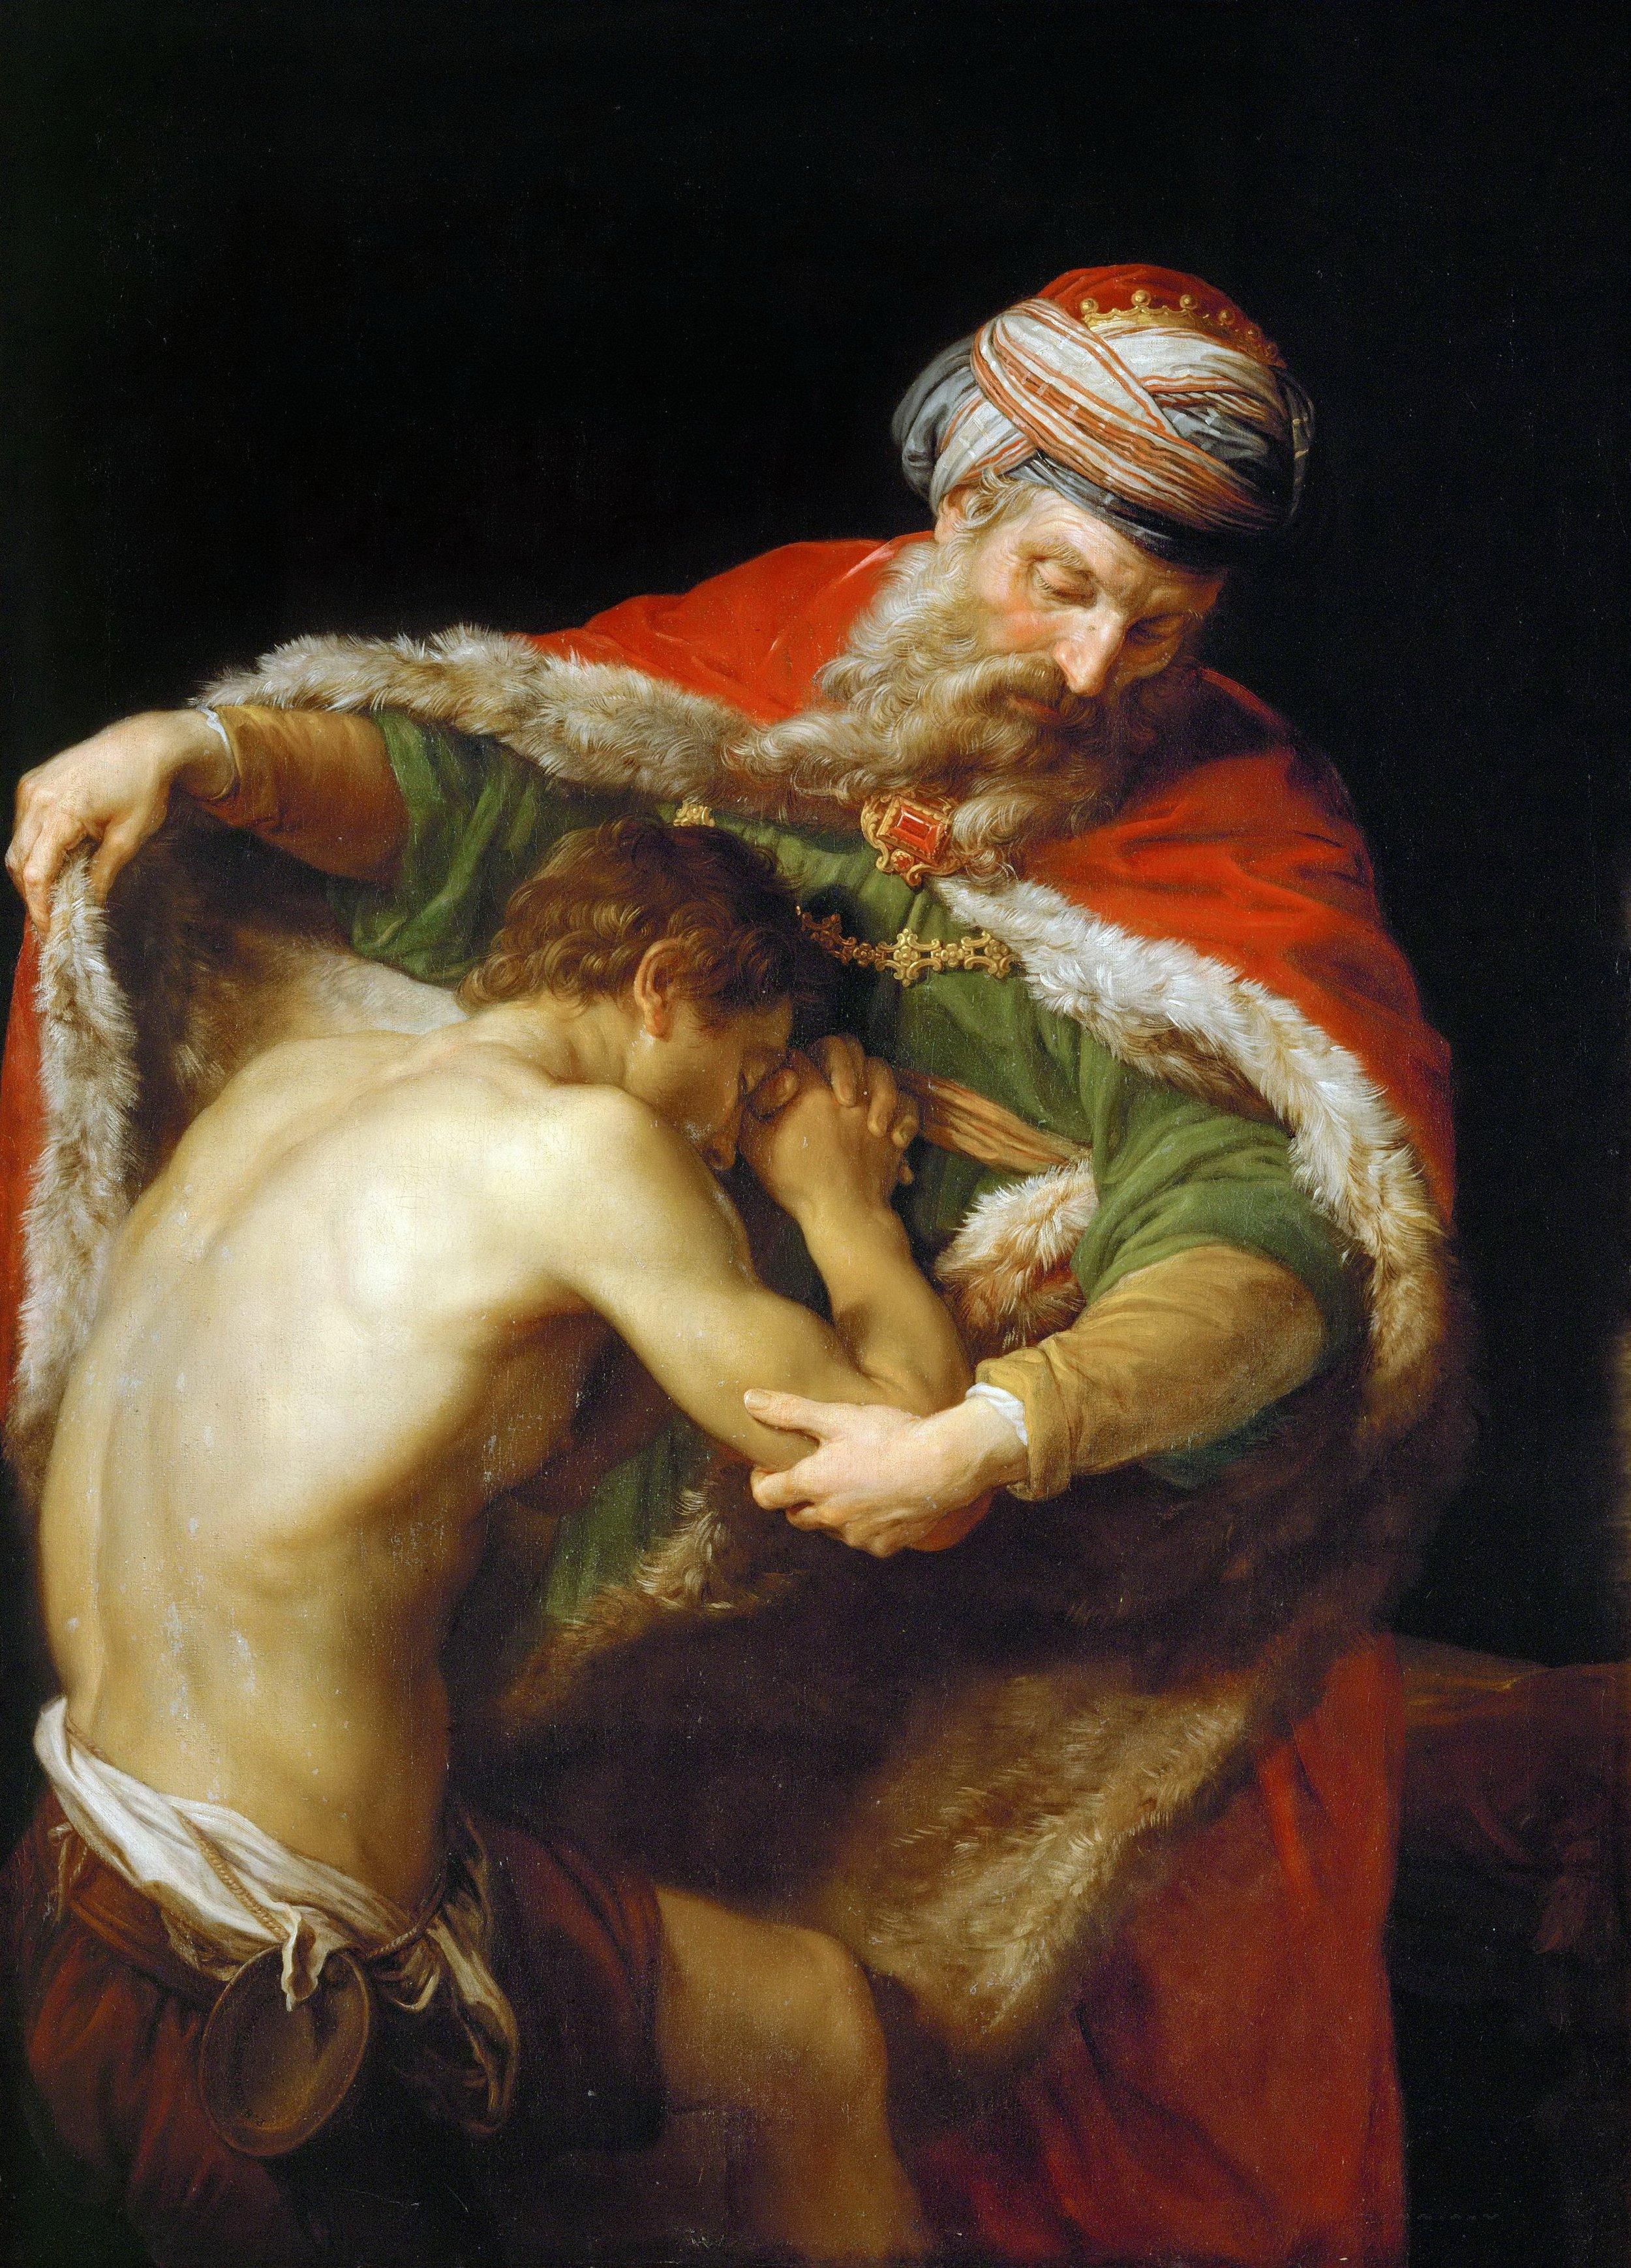 Return of the Prodigal Son, Pompeo Batoni. 1773.